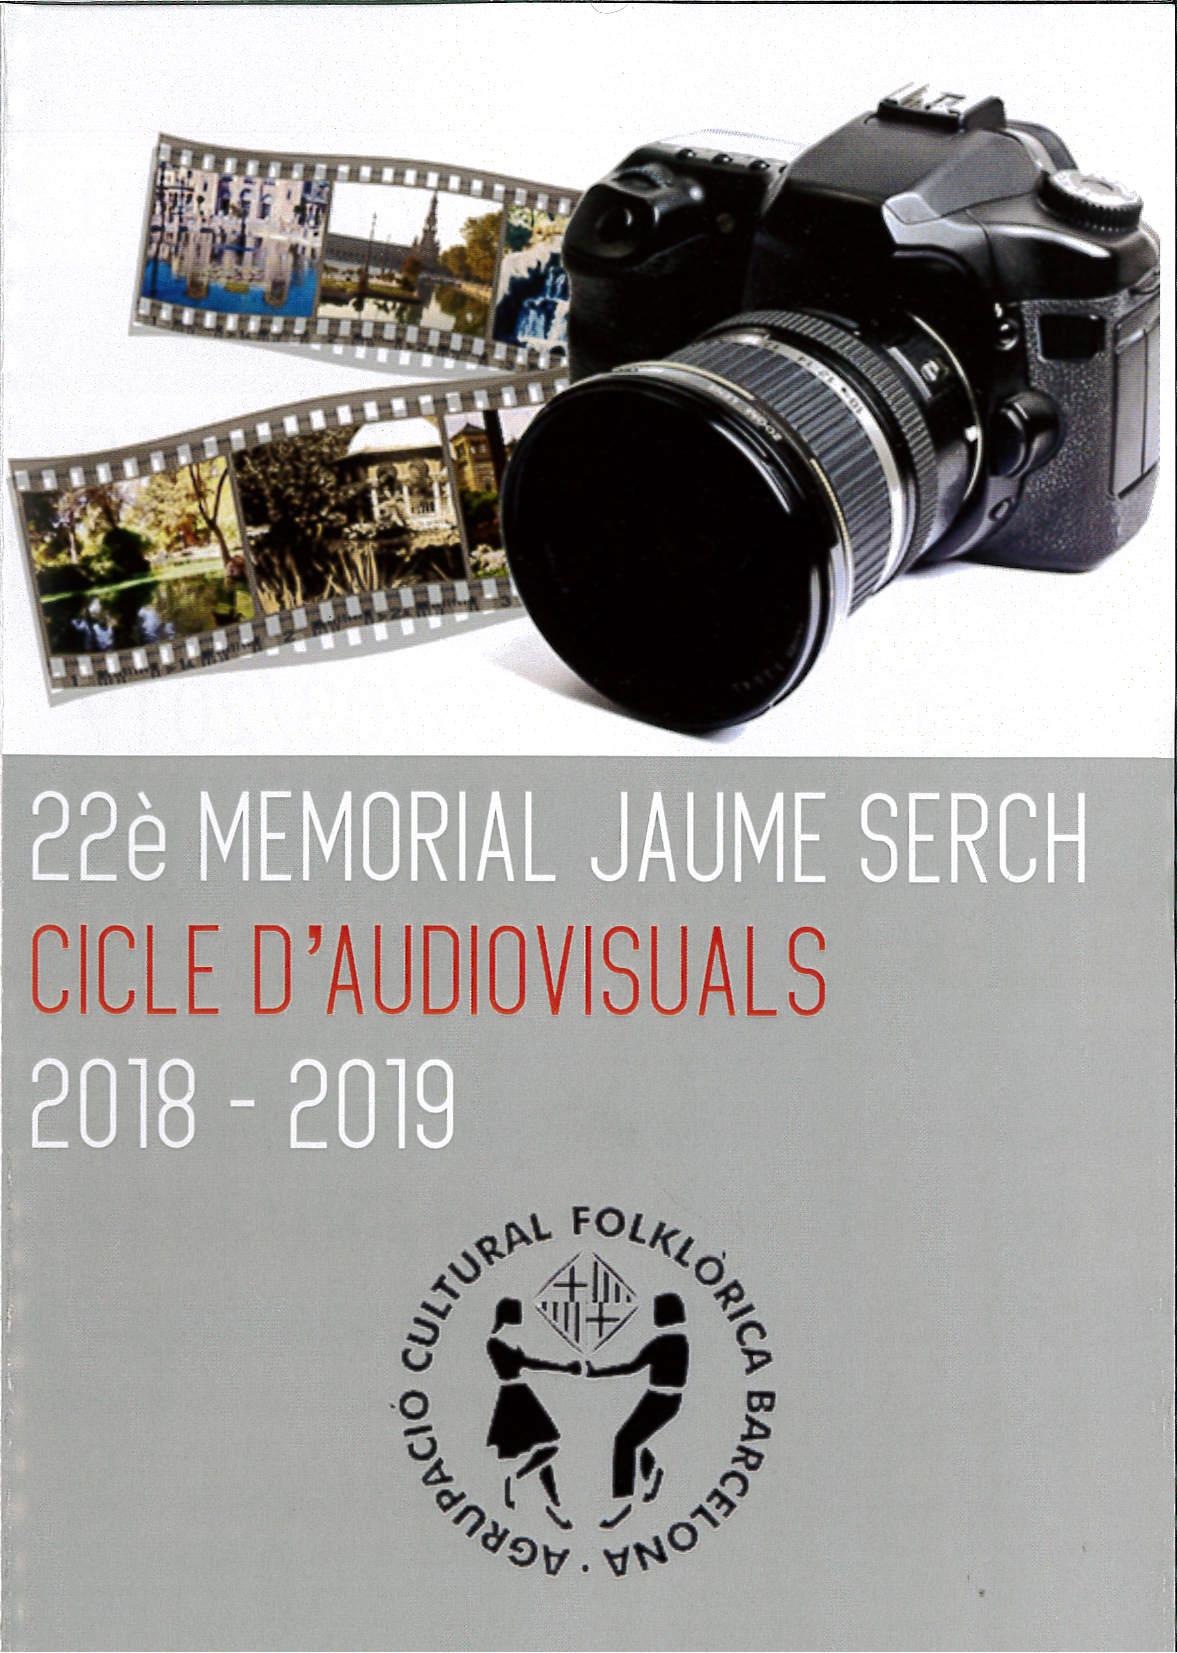 22è Cicle d'audiovisuals Memorial Jaume Serch @ Casa de la Sardana